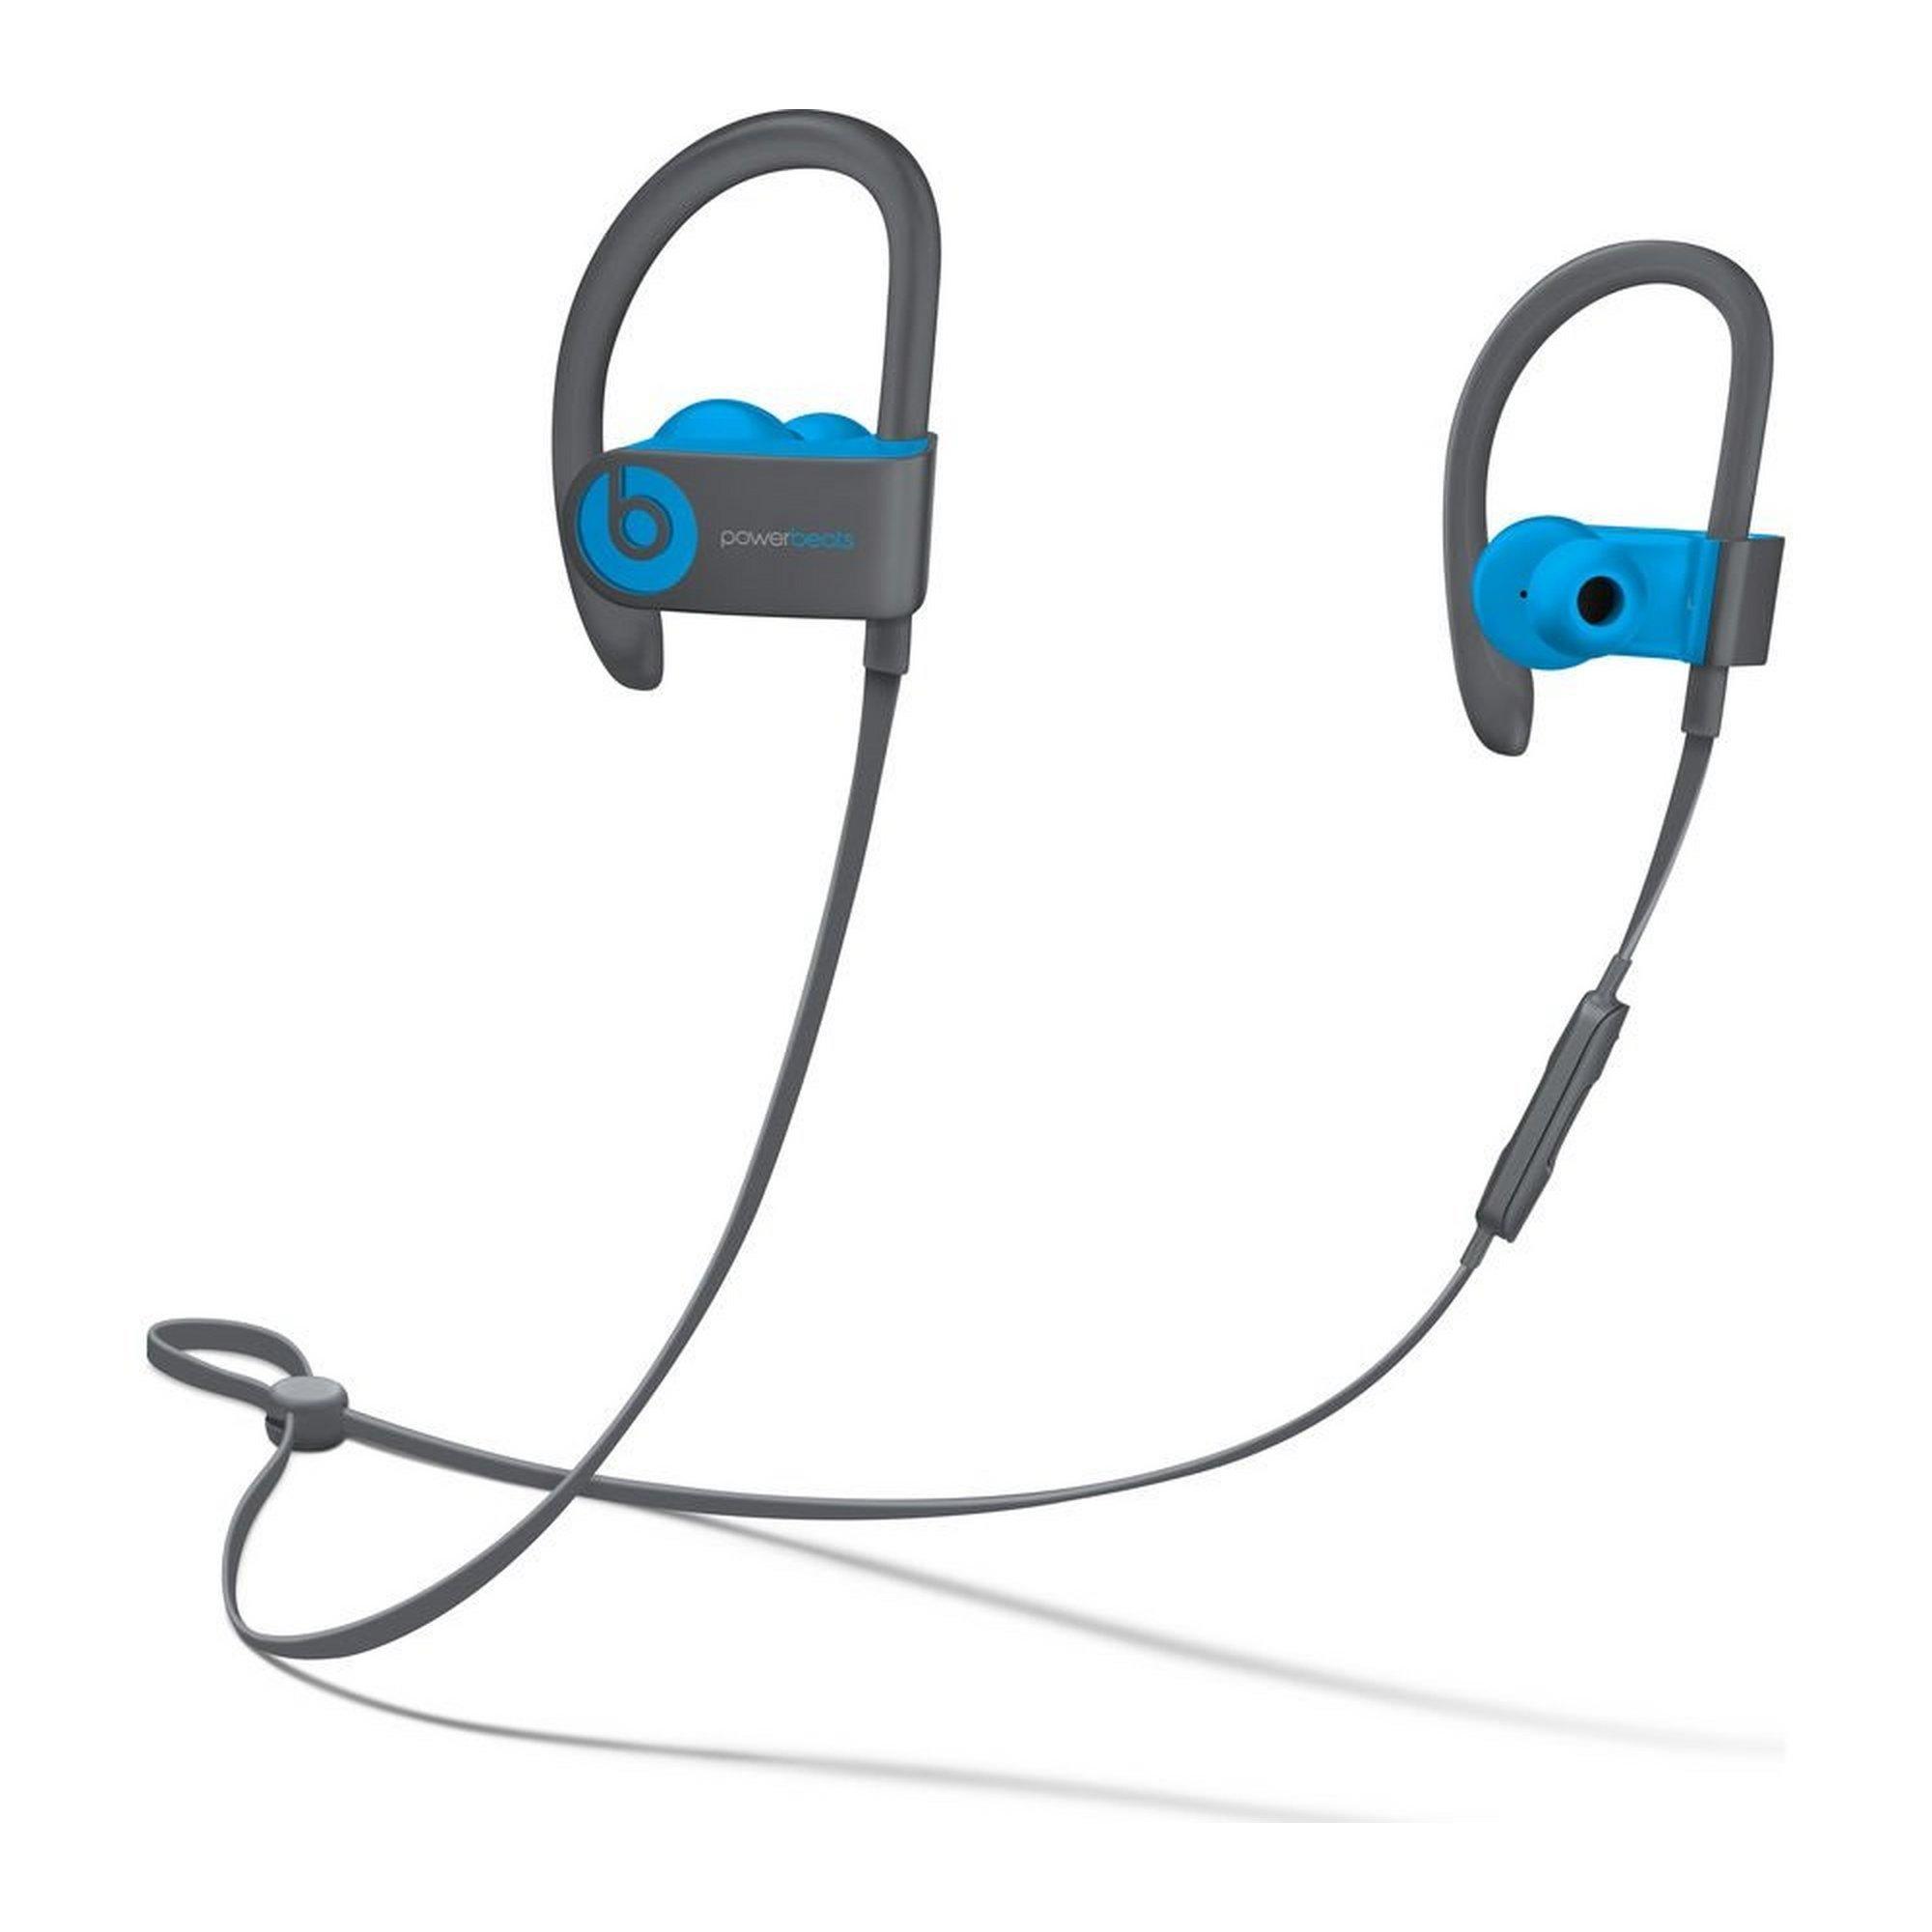 Image of Powerbeats3 Wireless Earphones